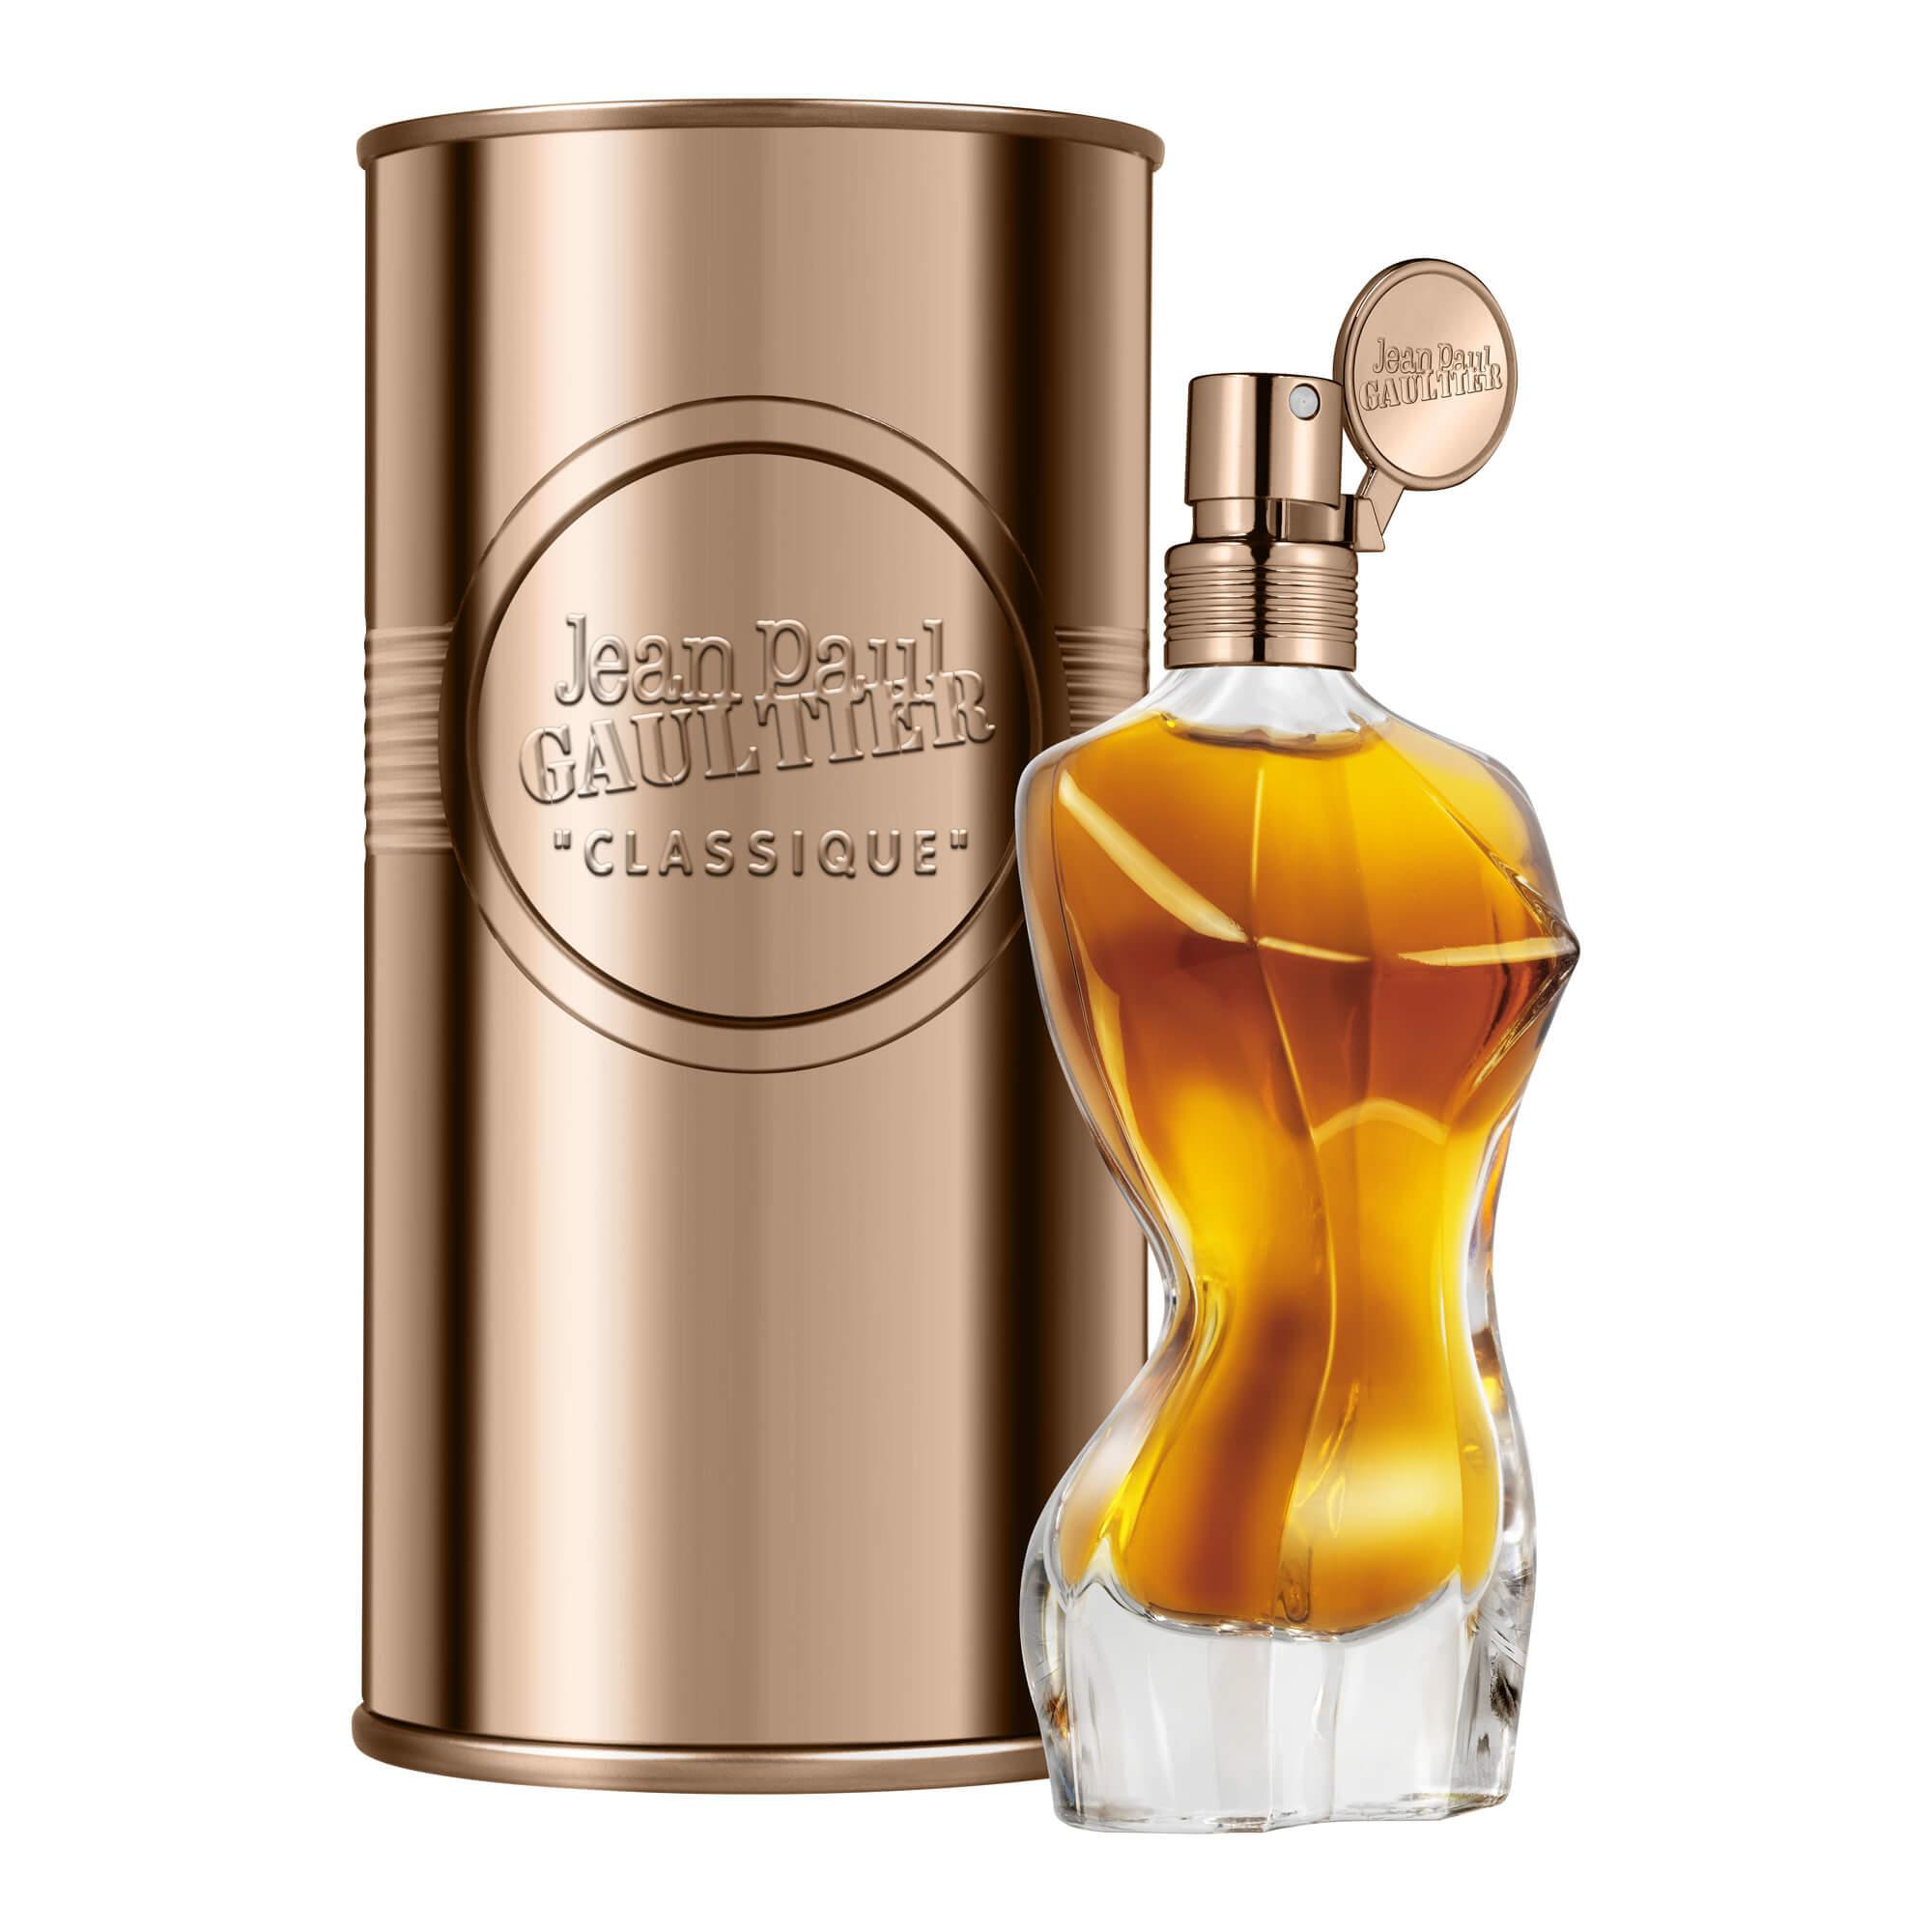 Jean P. Gaultier Classique Essence de Parfum - EDP50 ml